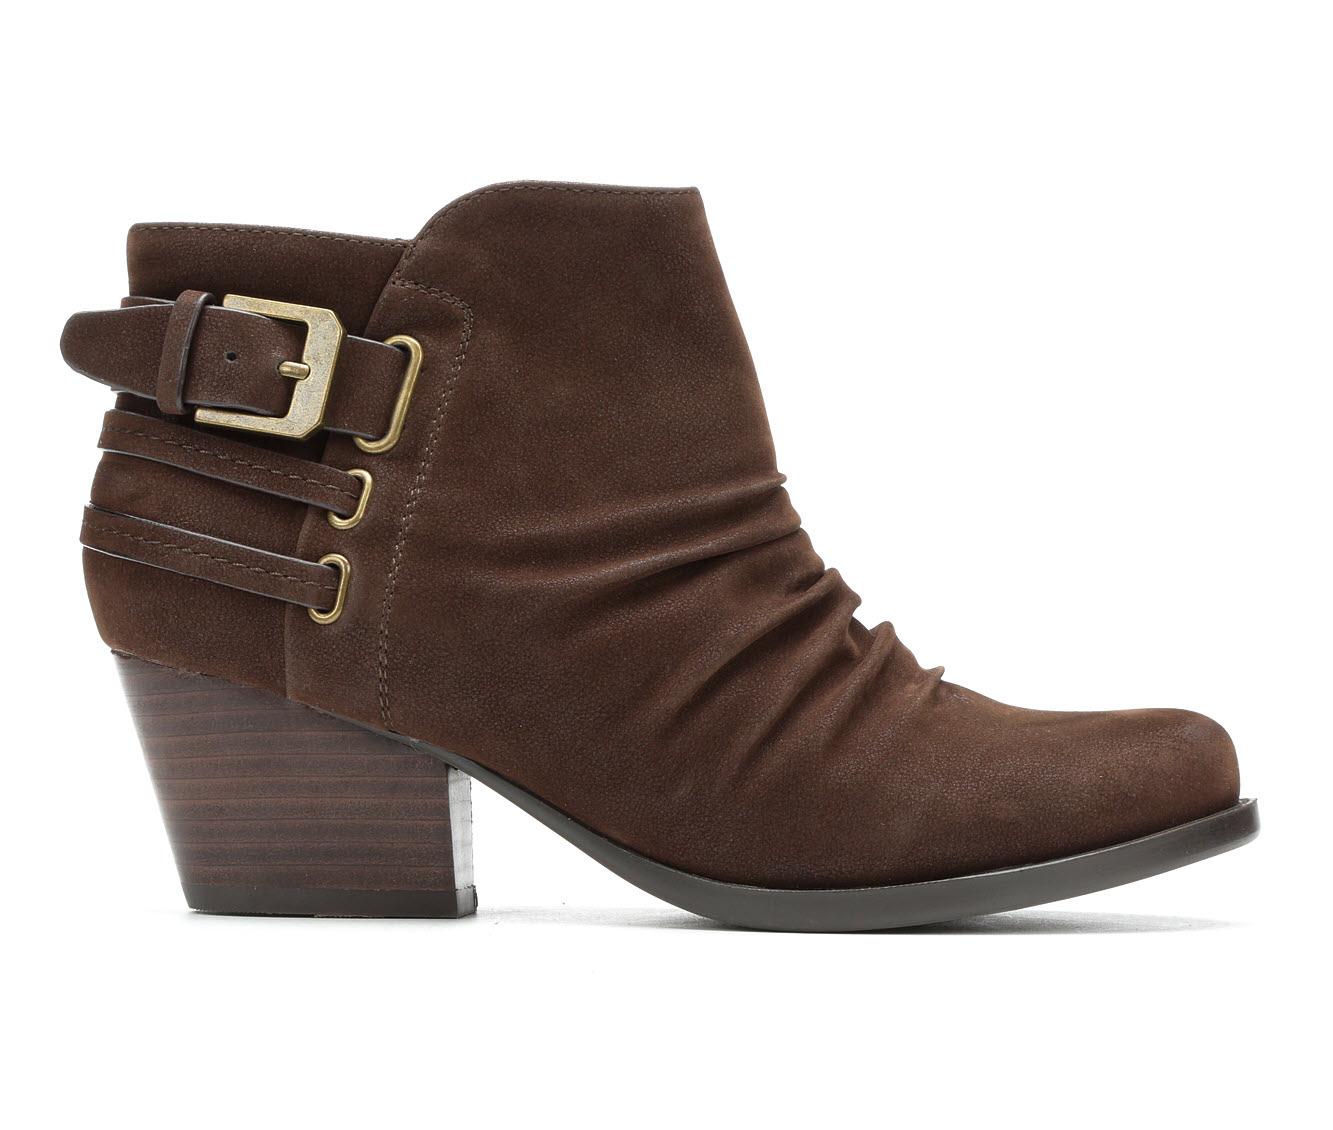 Baretraps Remming Women's Boot (Brown Canvas)